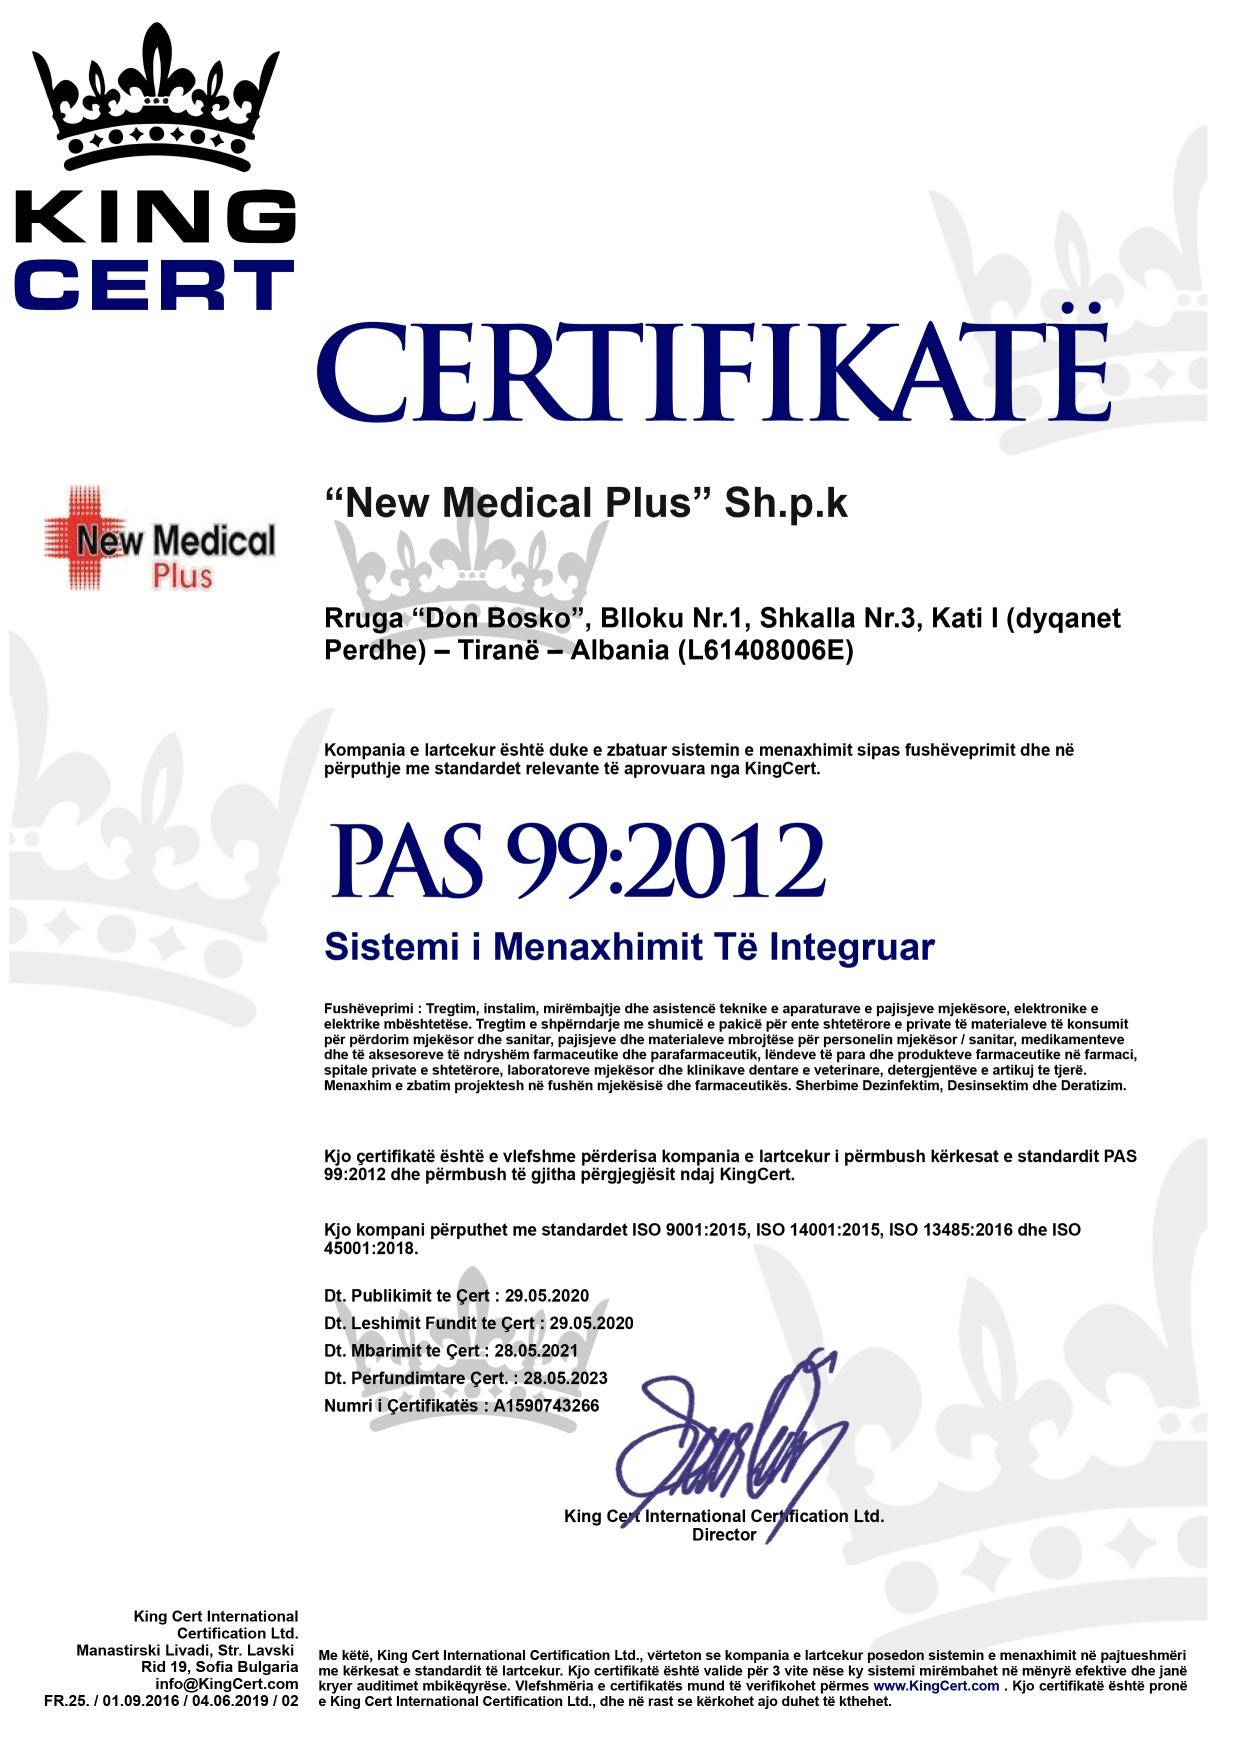 NEW MEDICAL PLUS WEBSITE CERTIFIKATA 2